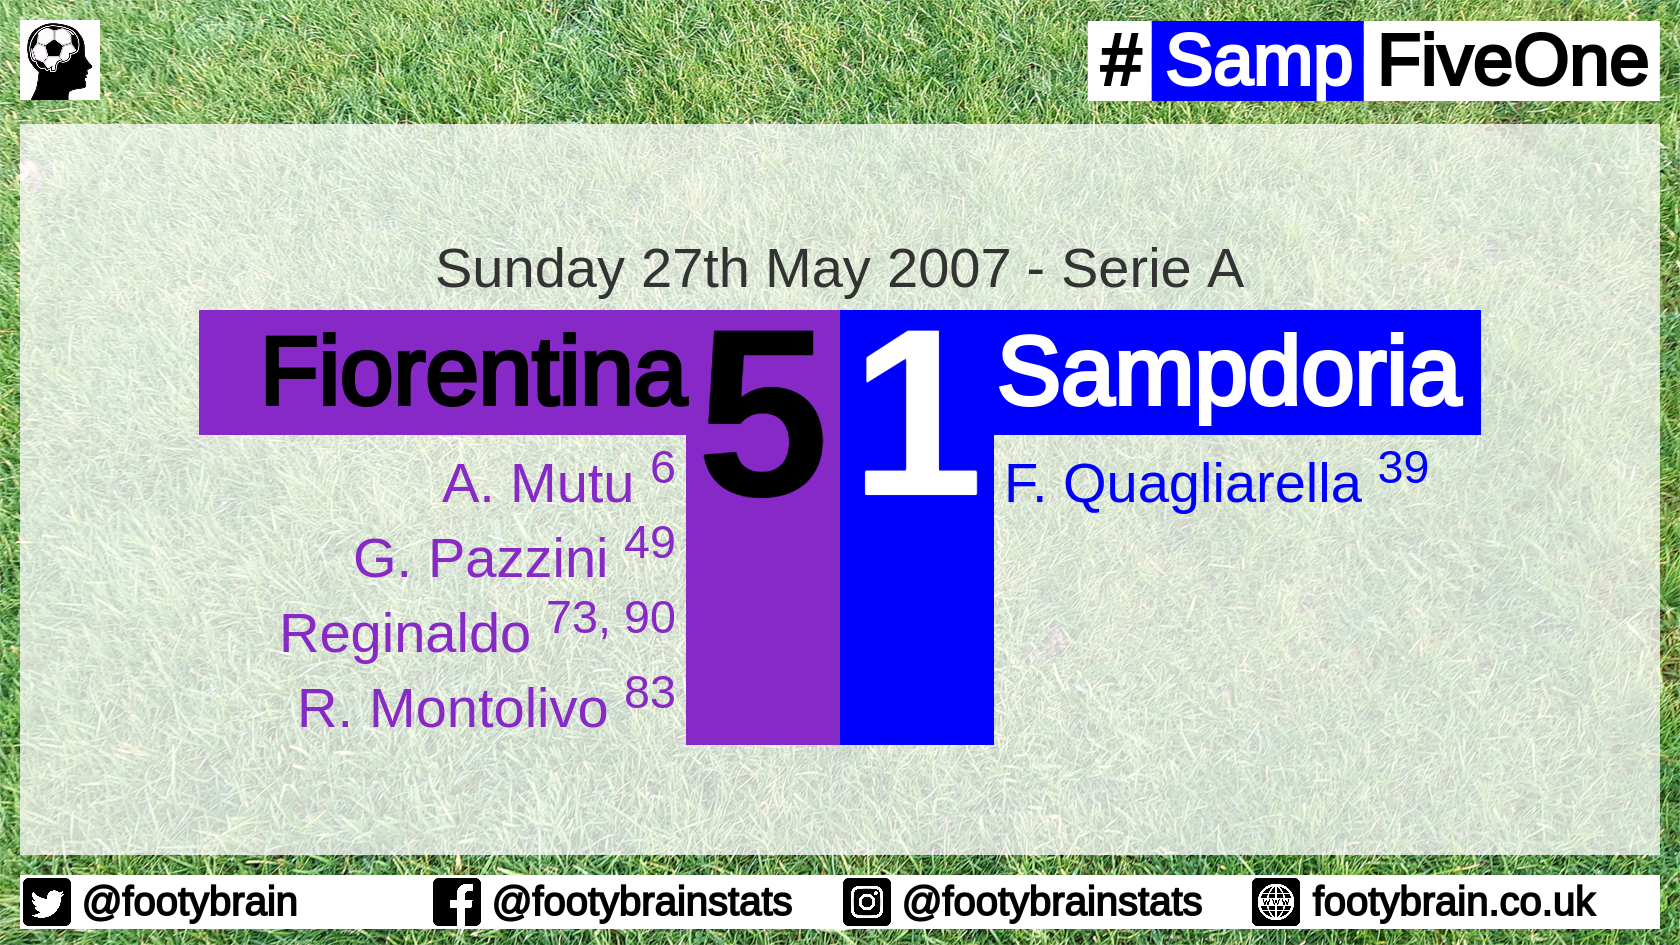 Fiorentina 5 Sampdoria 1, 2007